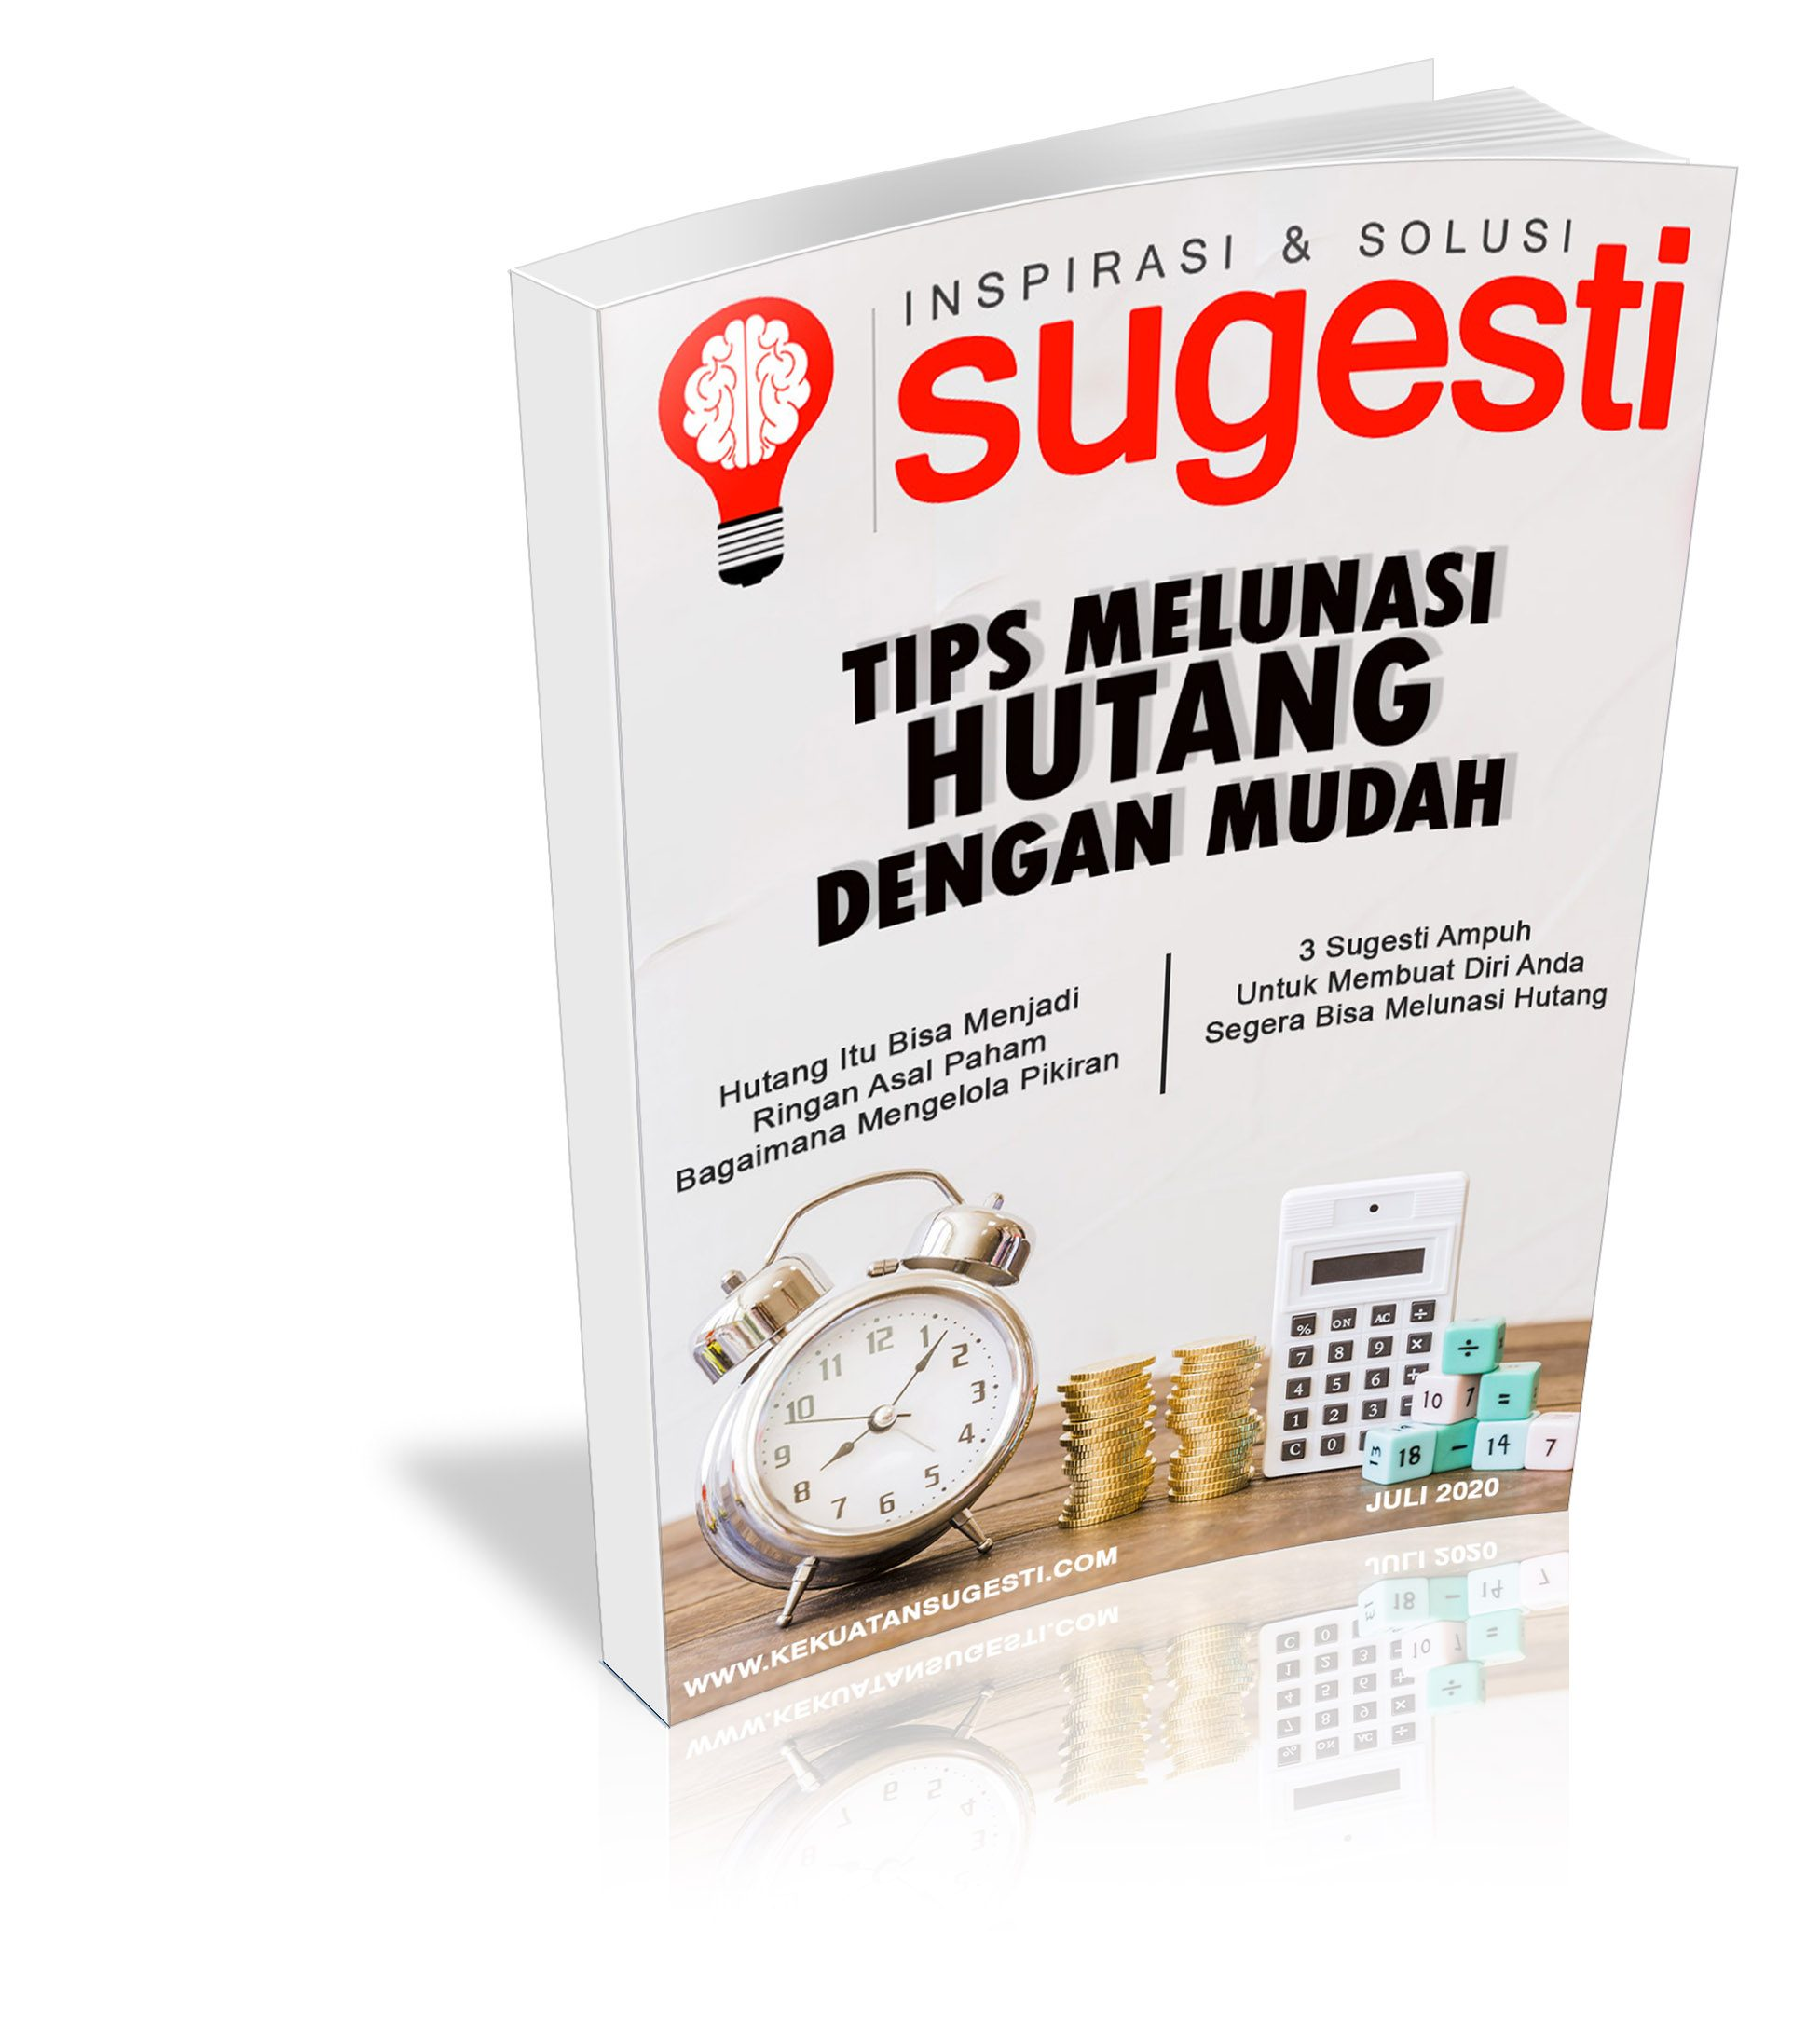 Majalah Sugesti Edisi Ke Tujuh Puluh Tiga Bulan Juli 2020